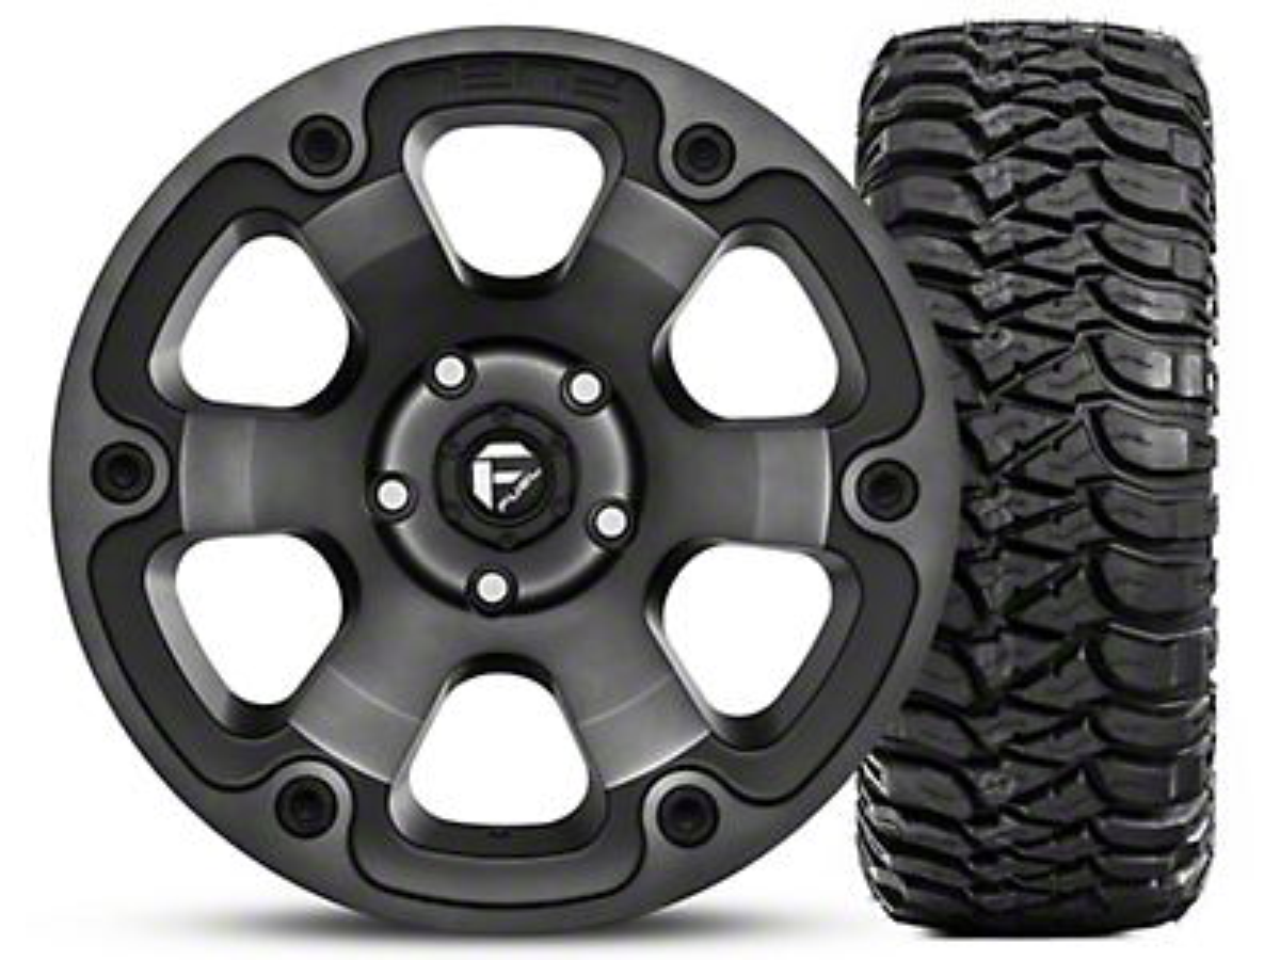 Fuel Wheels Beast Black Machined Wheel 17x9 and Mickey Thompson Baja MTZ Radial Tire w/OWL 305/65-17 Kit (07-18 Jeep Wrangler JK; 2018 Jeep Wrangler JL)